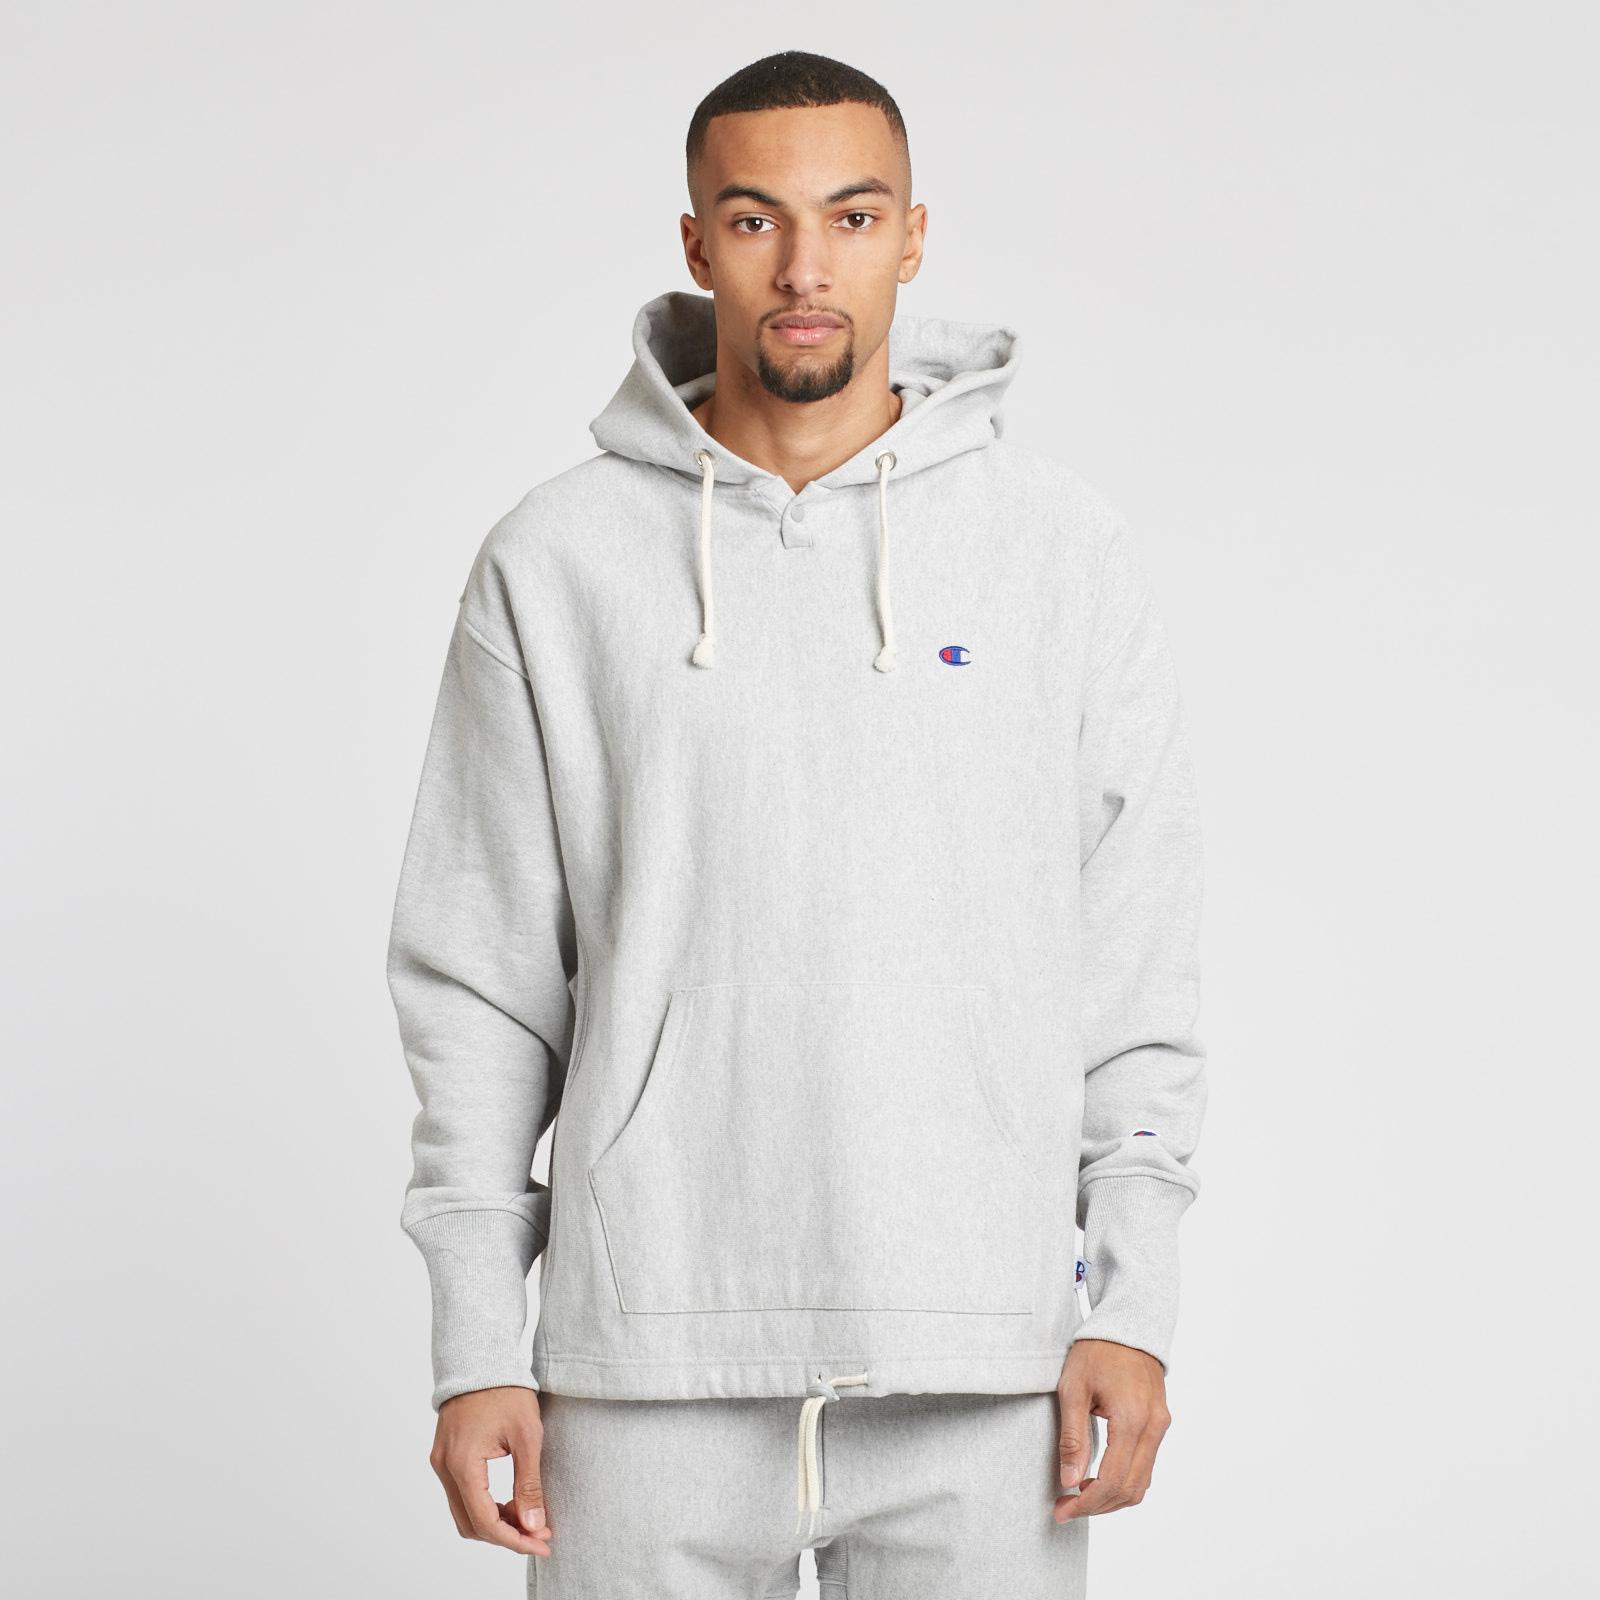 ed4bb957418 Champion Reverse Weave Hooded Sweatshirt x BEAMS - 211618-em004-gry ...